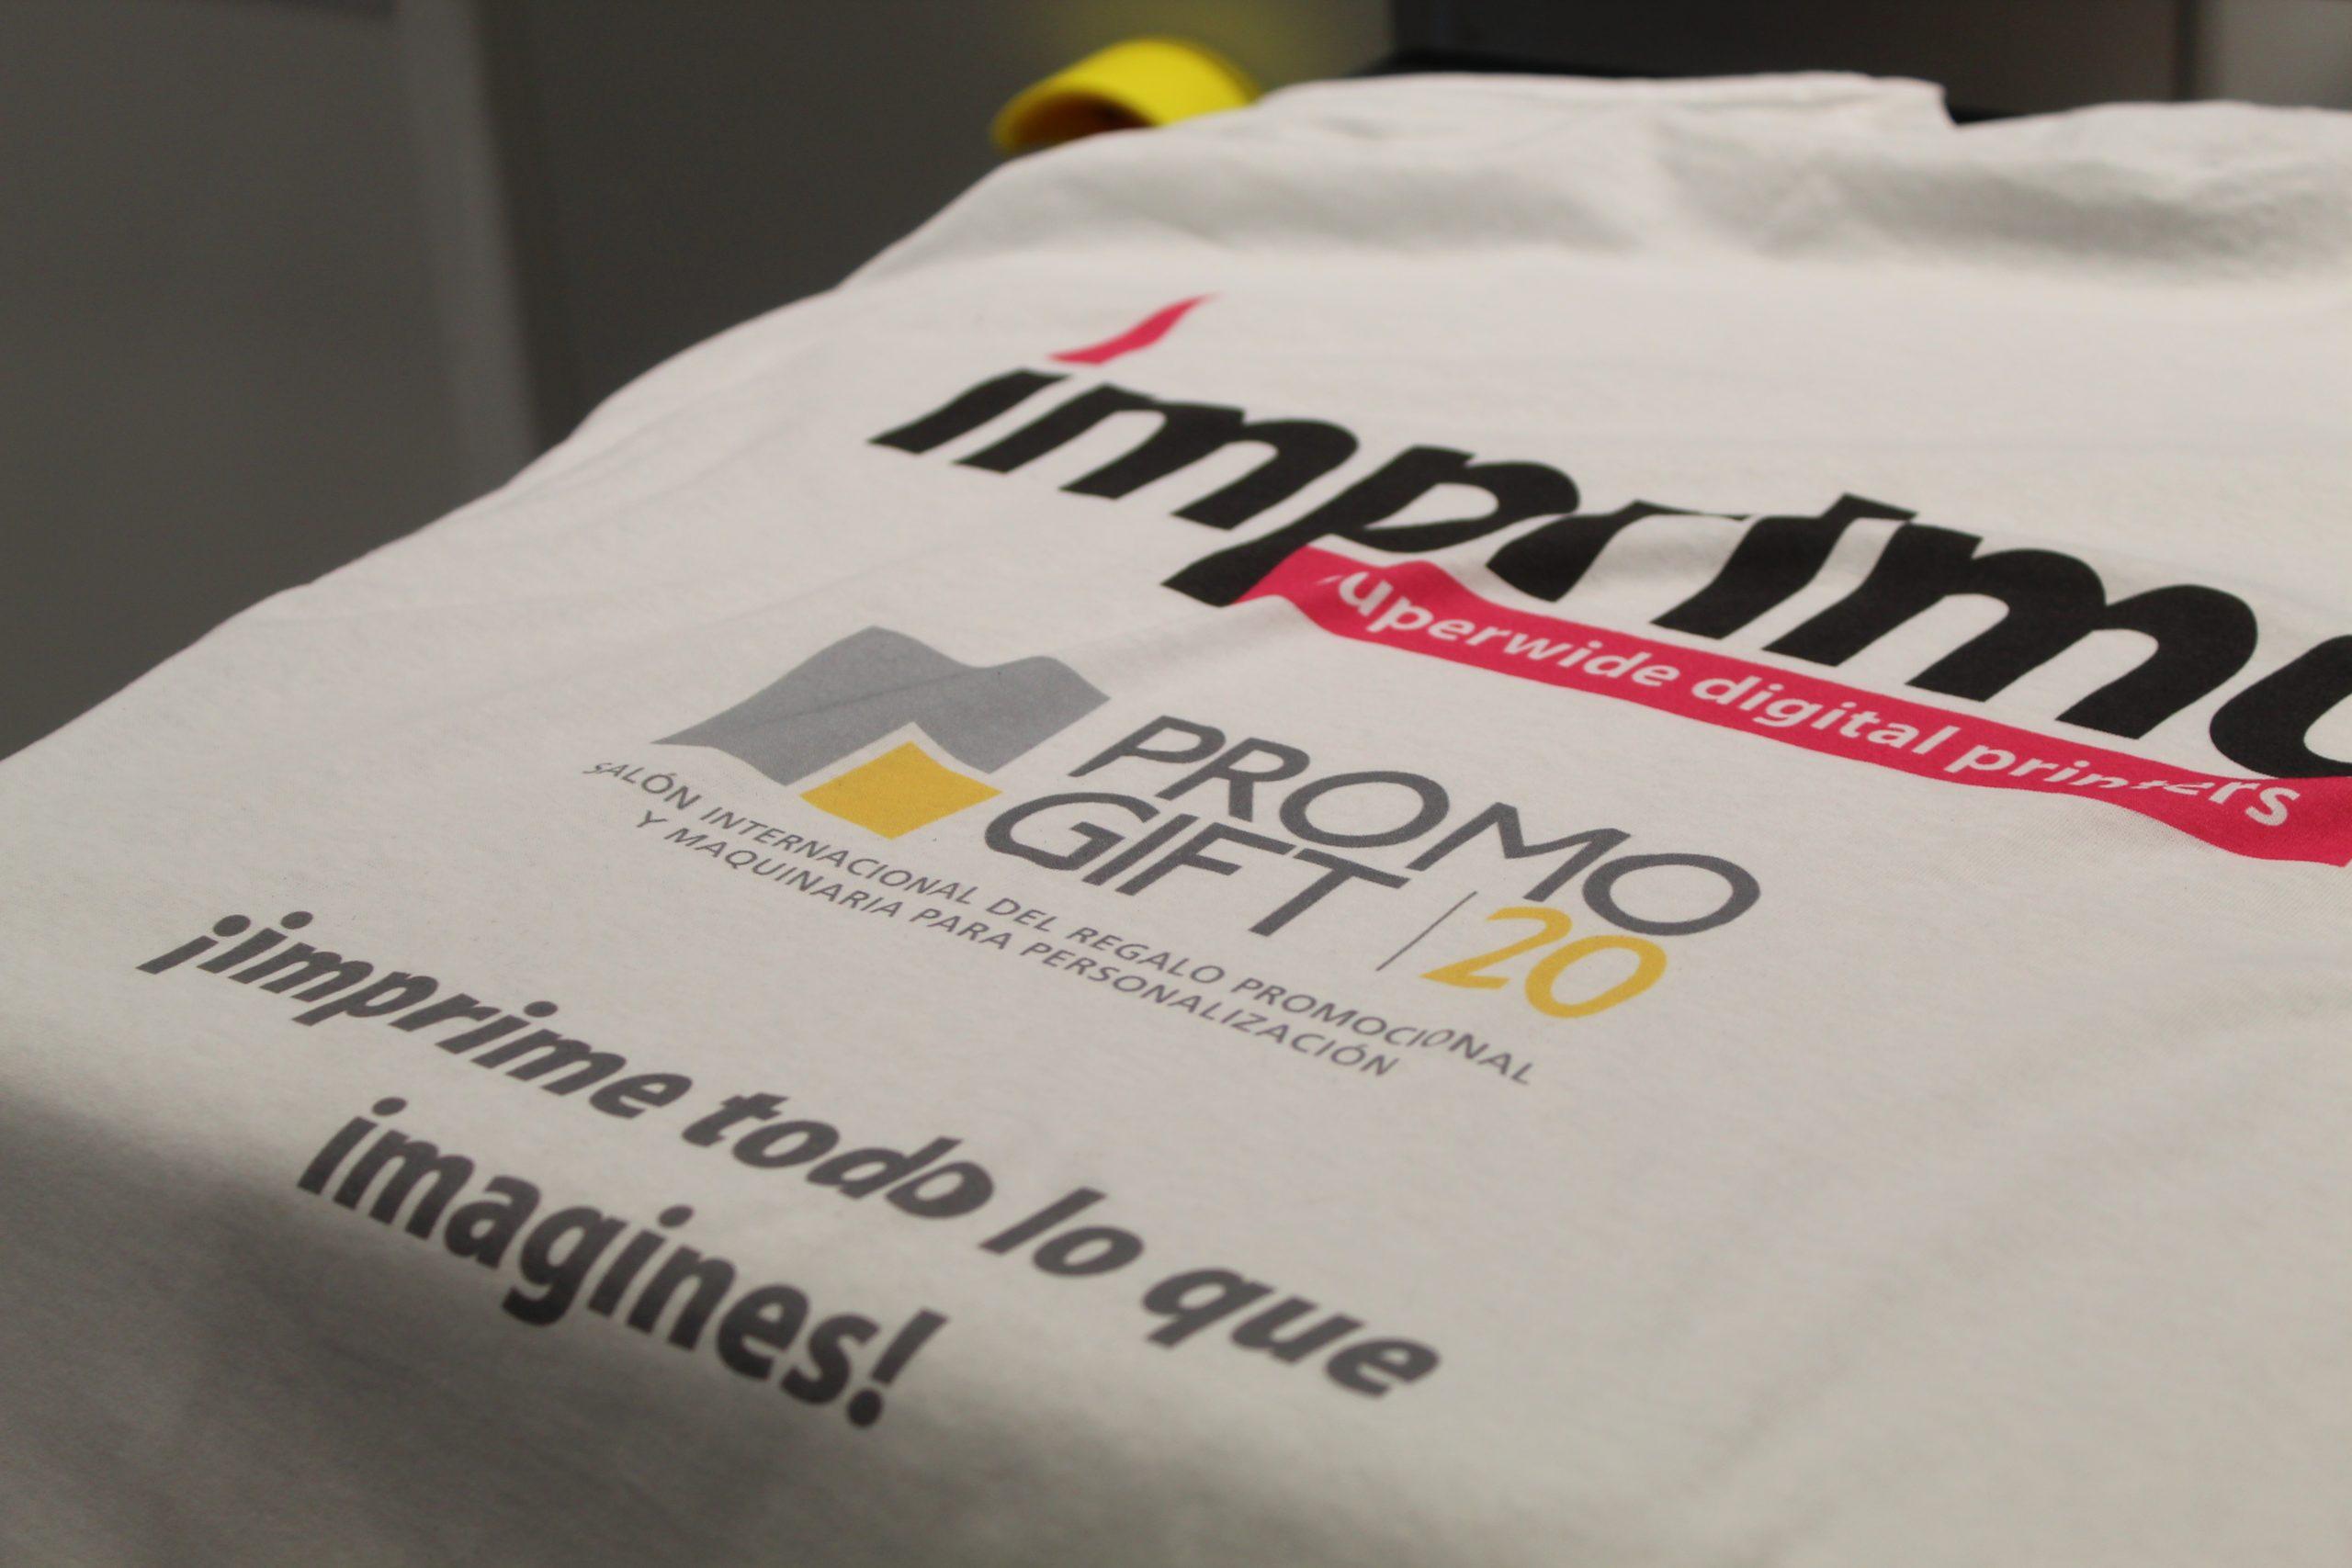 Camiseta impresa con maquina Imprimo